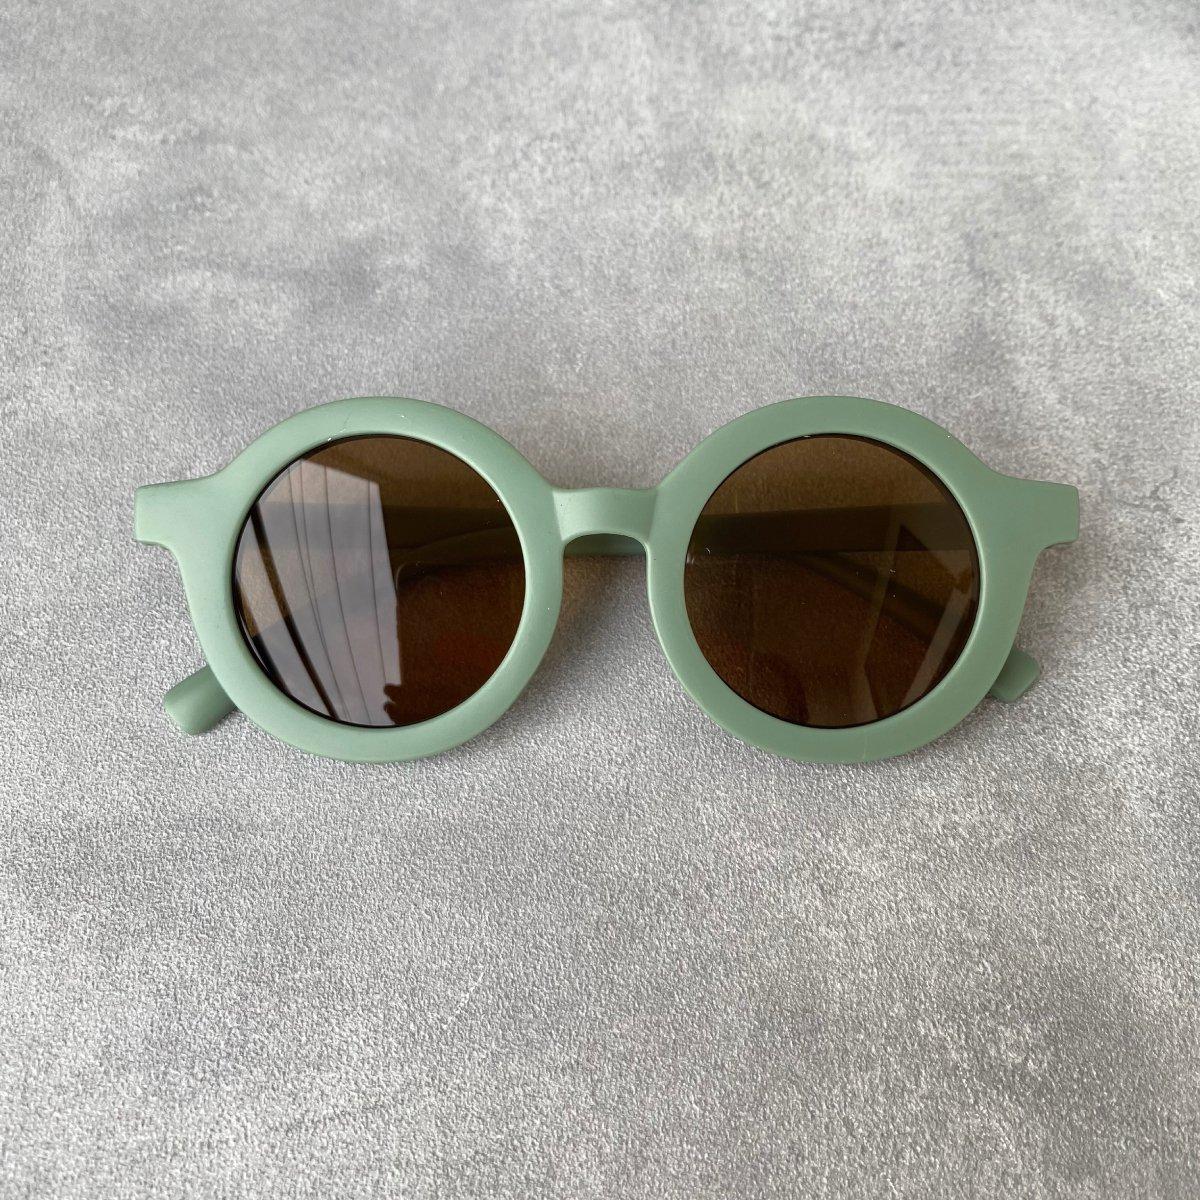 【KIDS】Kids Colorful Sunglasses 詳細画像2